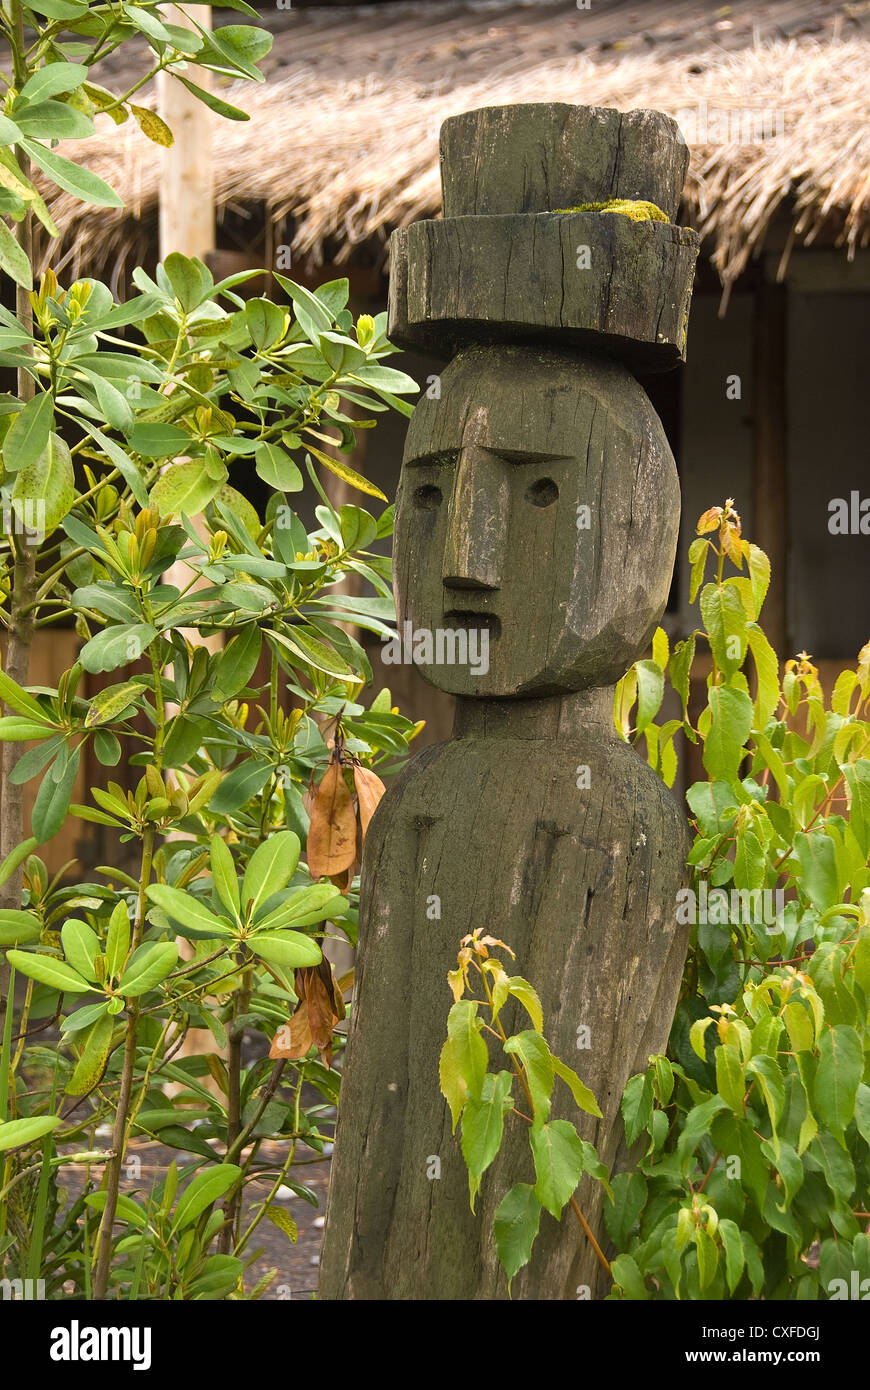 Elk198-3208v Chile, Villarrica, Mapuche Indian effigy poles - Stock Image